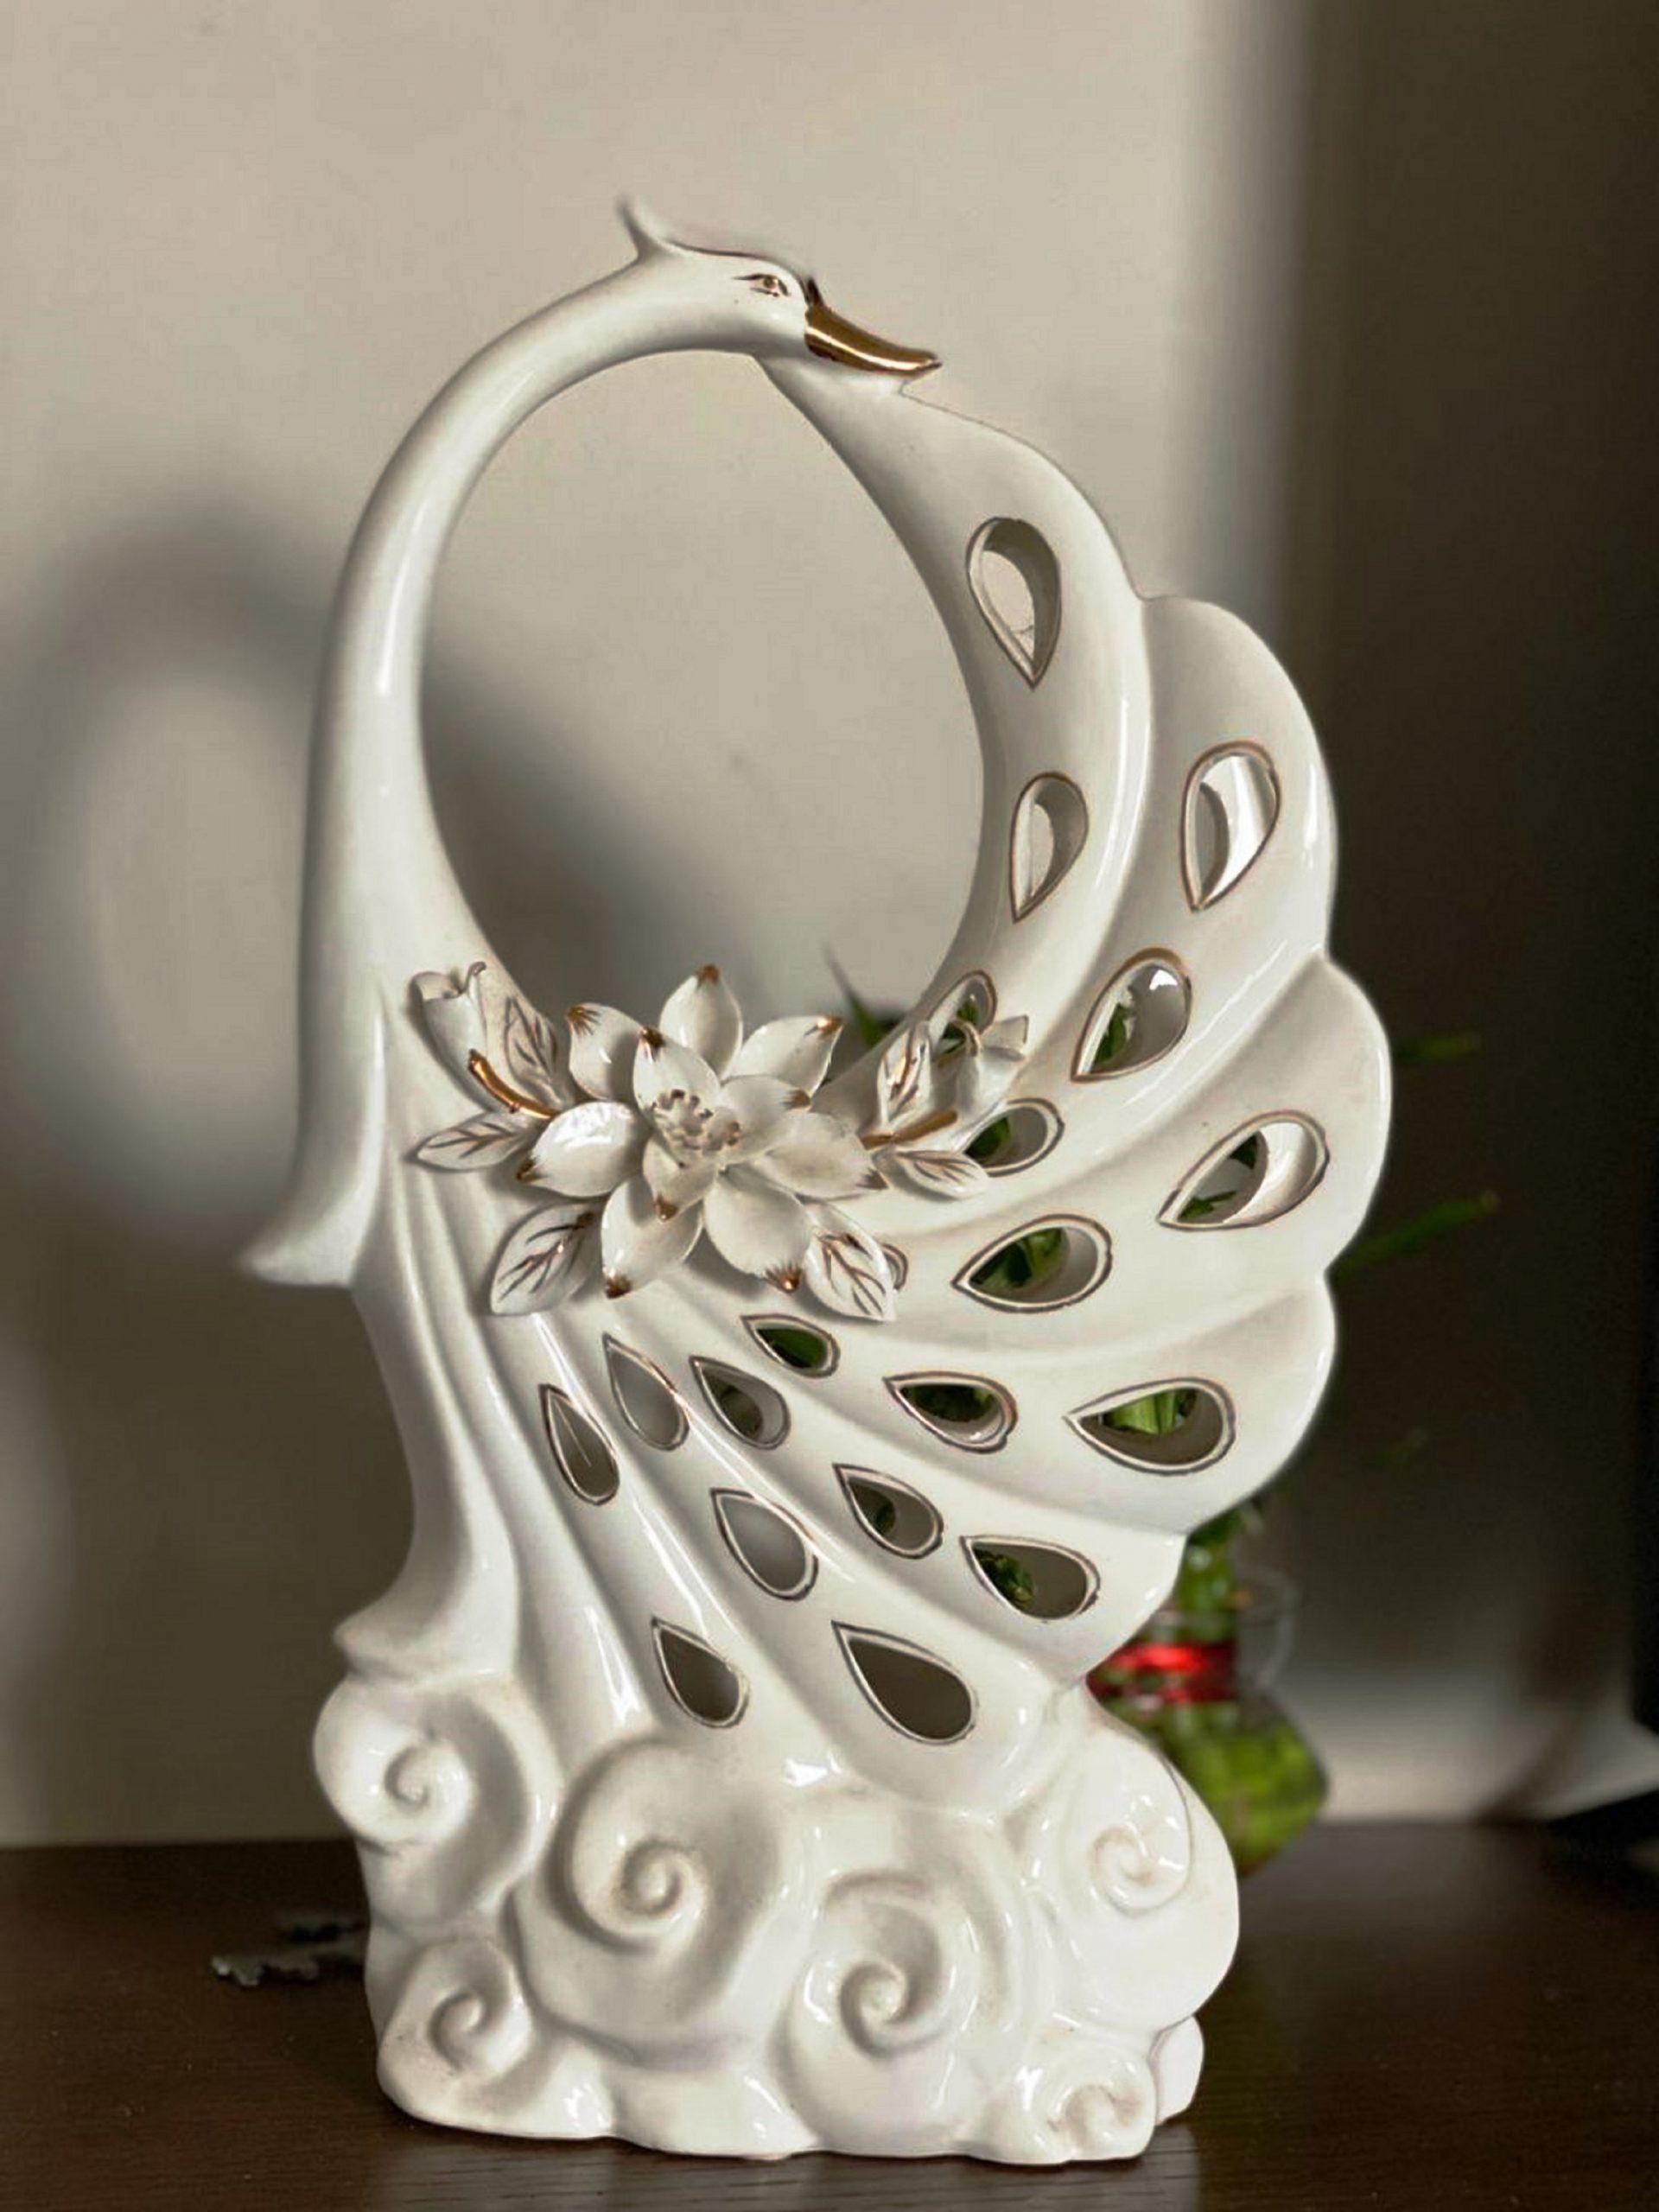 peacock shaped vase